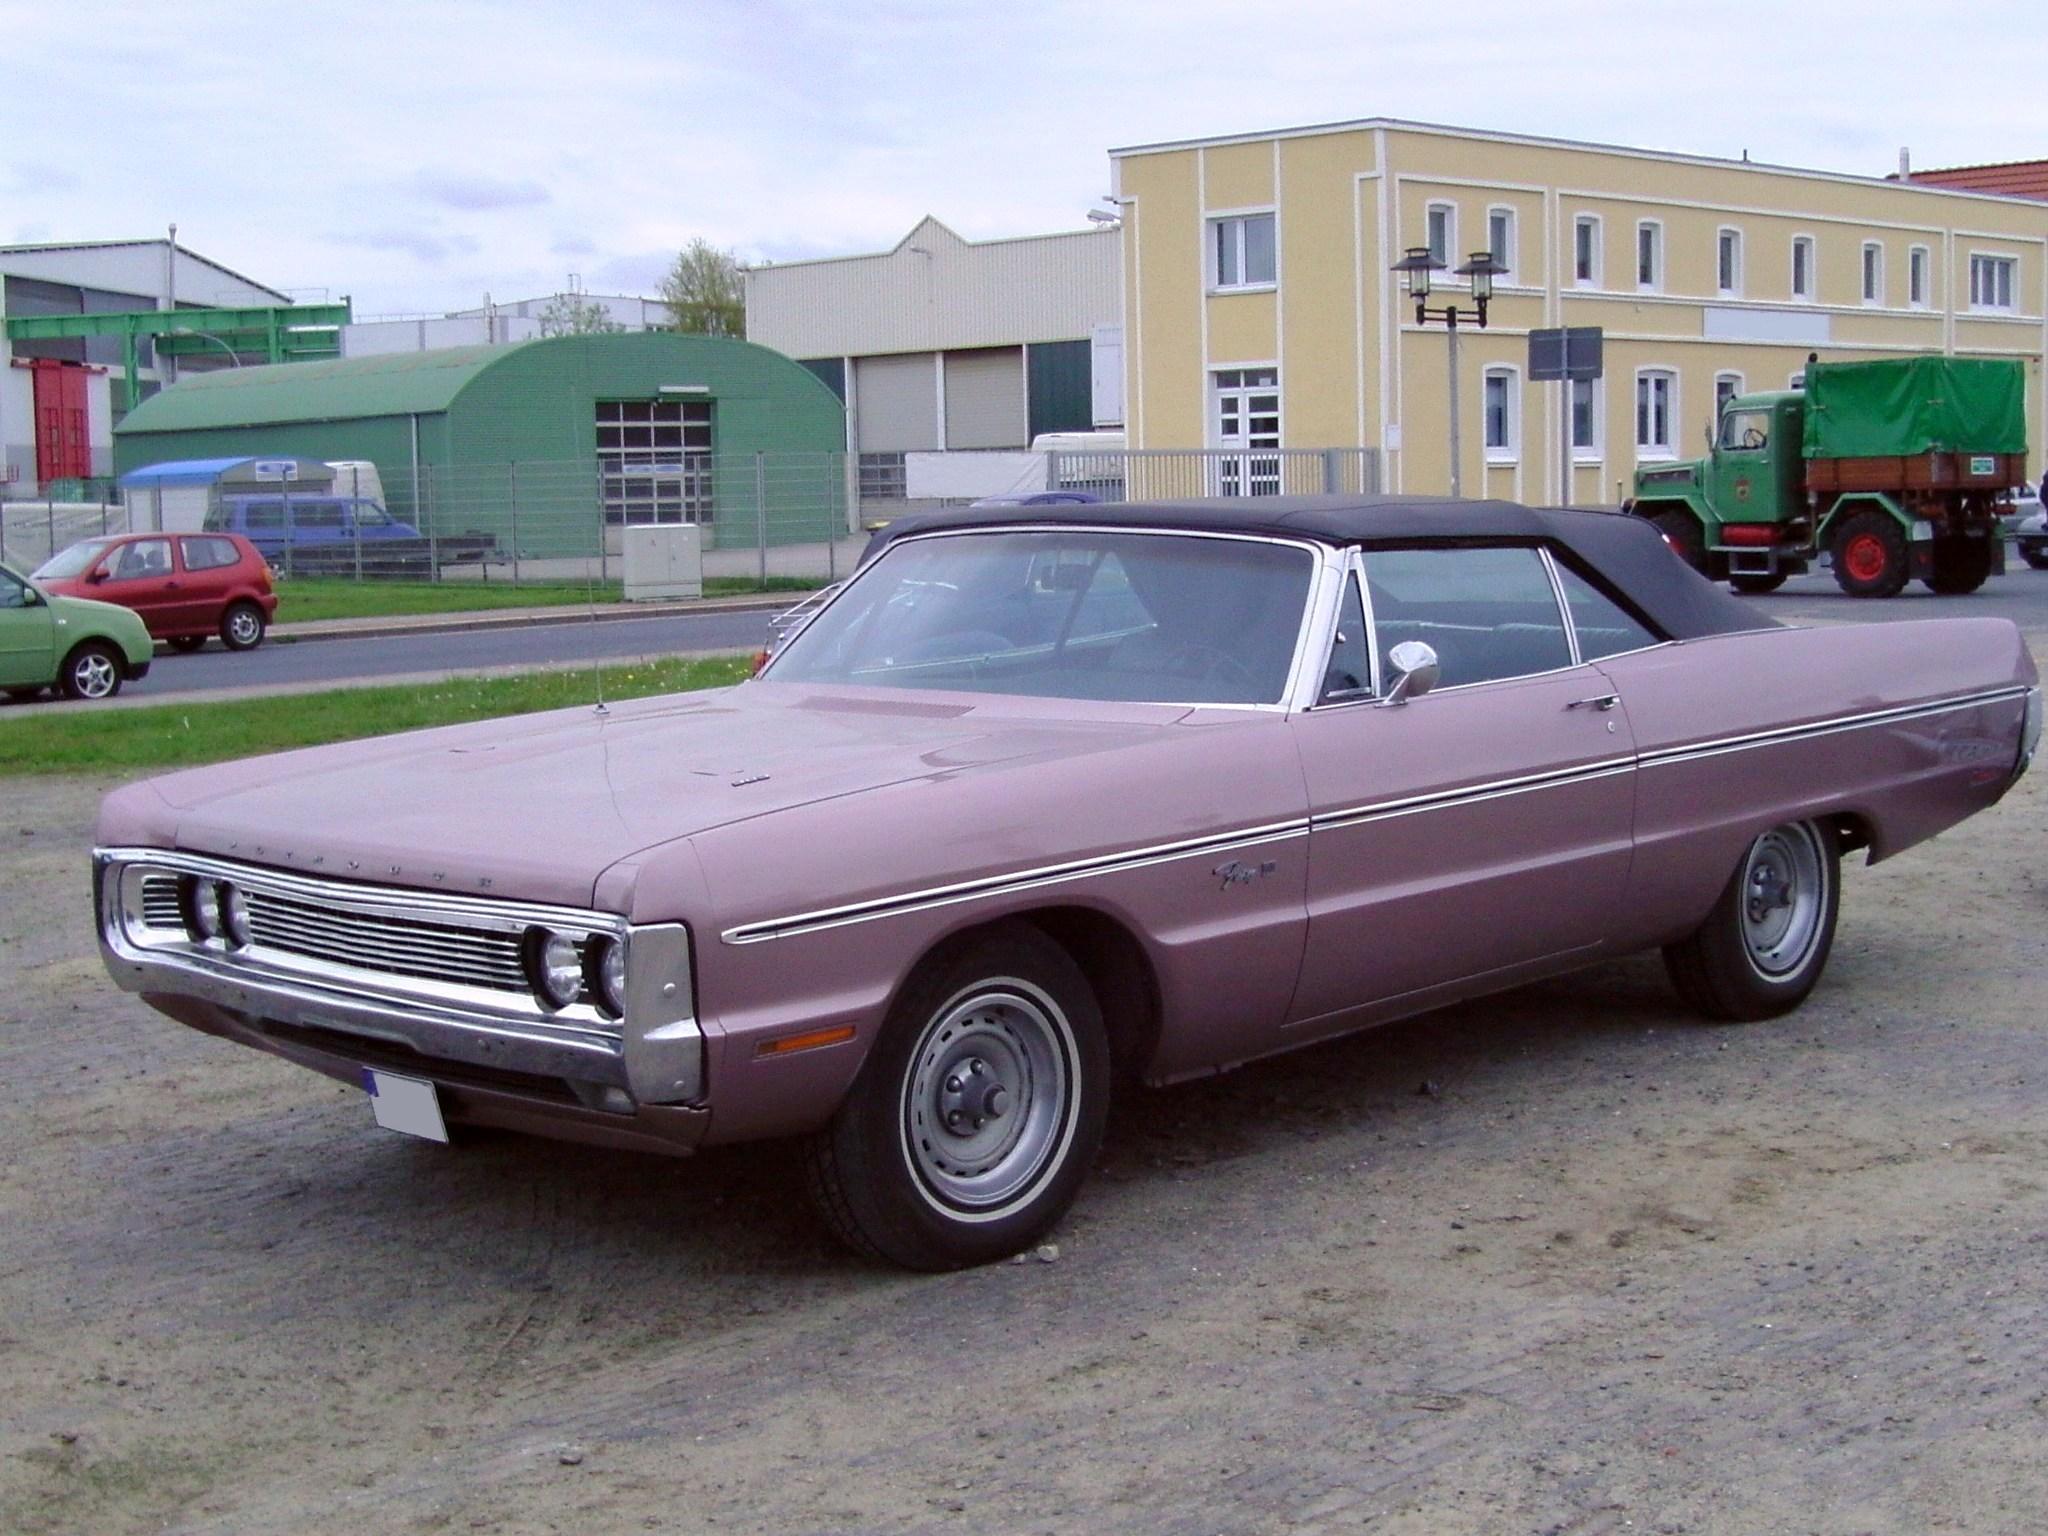 Plymouth Classic Cars Foe Sale Needing Repair